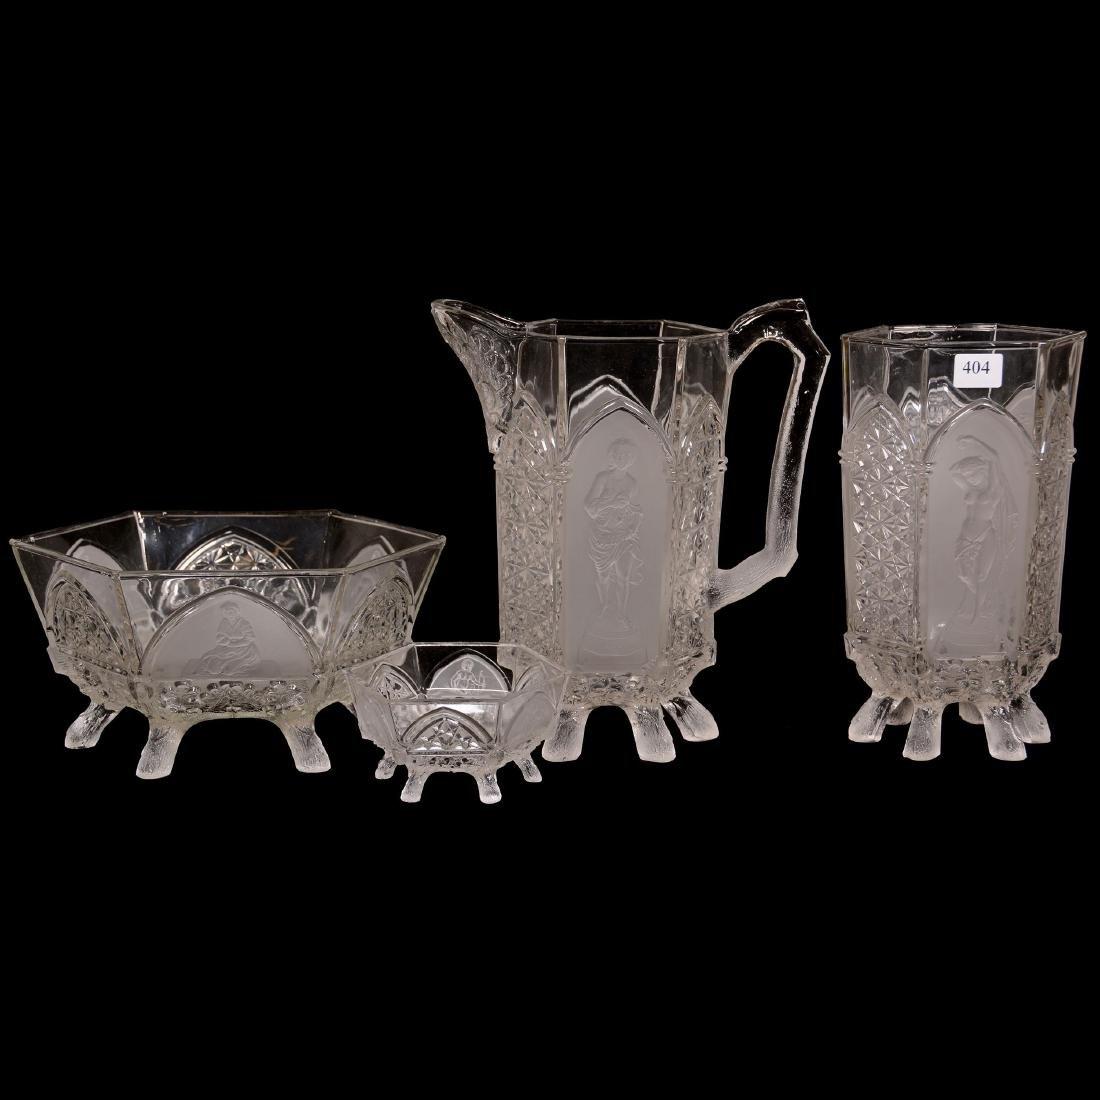 Four Piece Pattern Glass Set